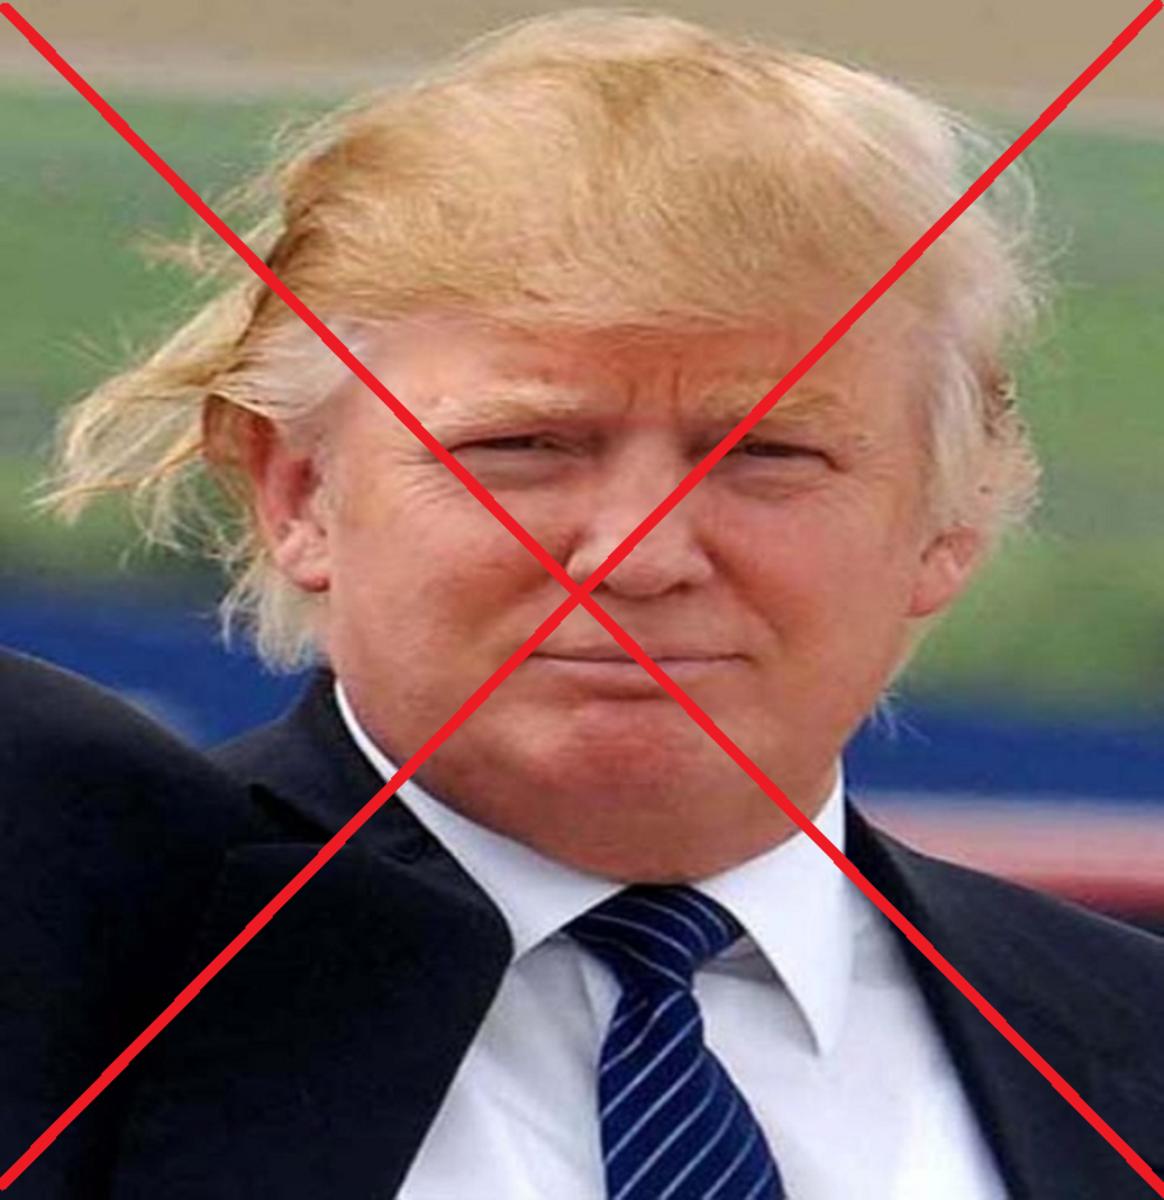 a-case-against-donald-trump